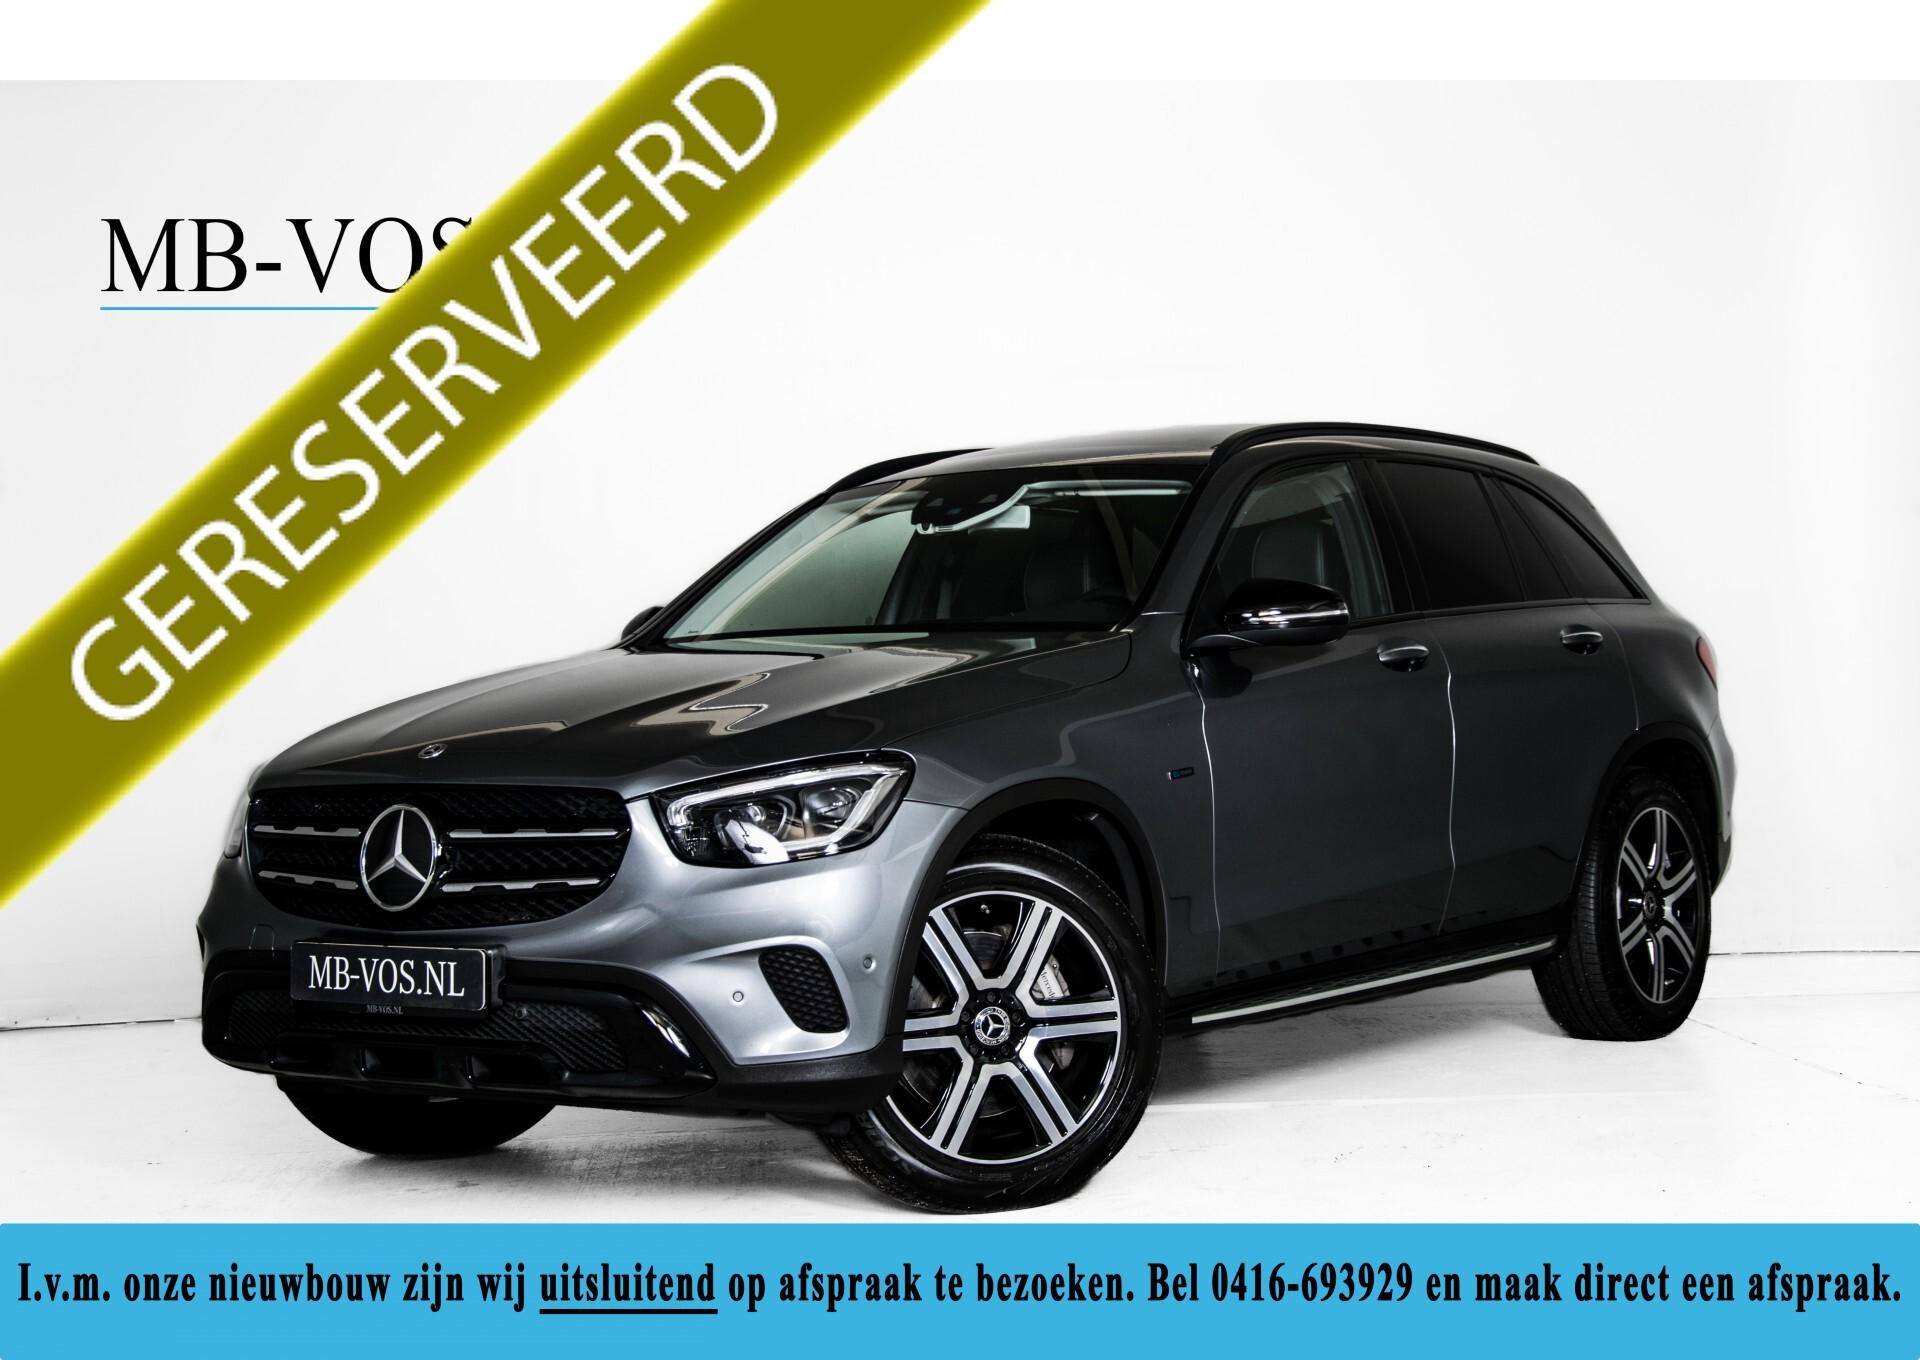 Mercedes-Benz GLC 300e 4-M Luchtvering/Panorama/Multicontourstoelen/Rij-assistentie/Standkachel Aut9 Foto 1